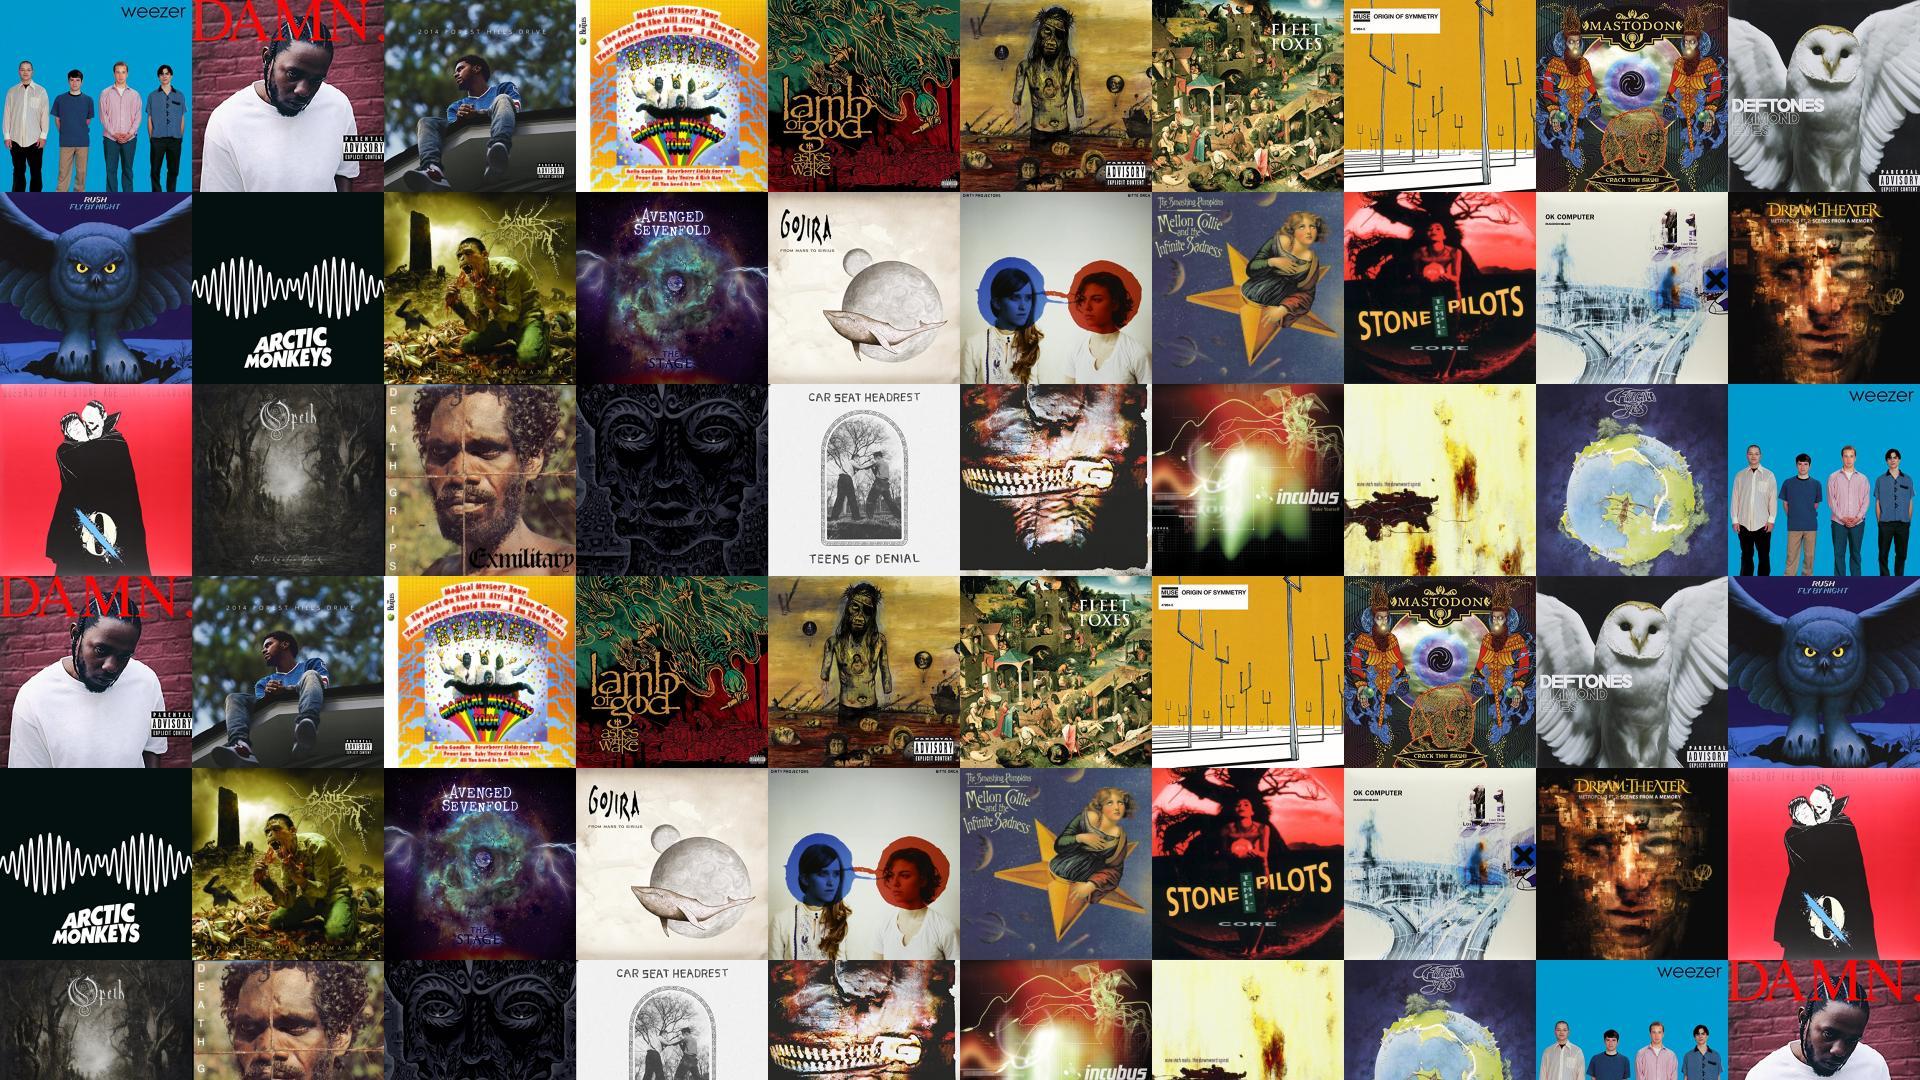 Weezer The Blue Album Kendrick Lamar Damn J Wallpaper Tiled